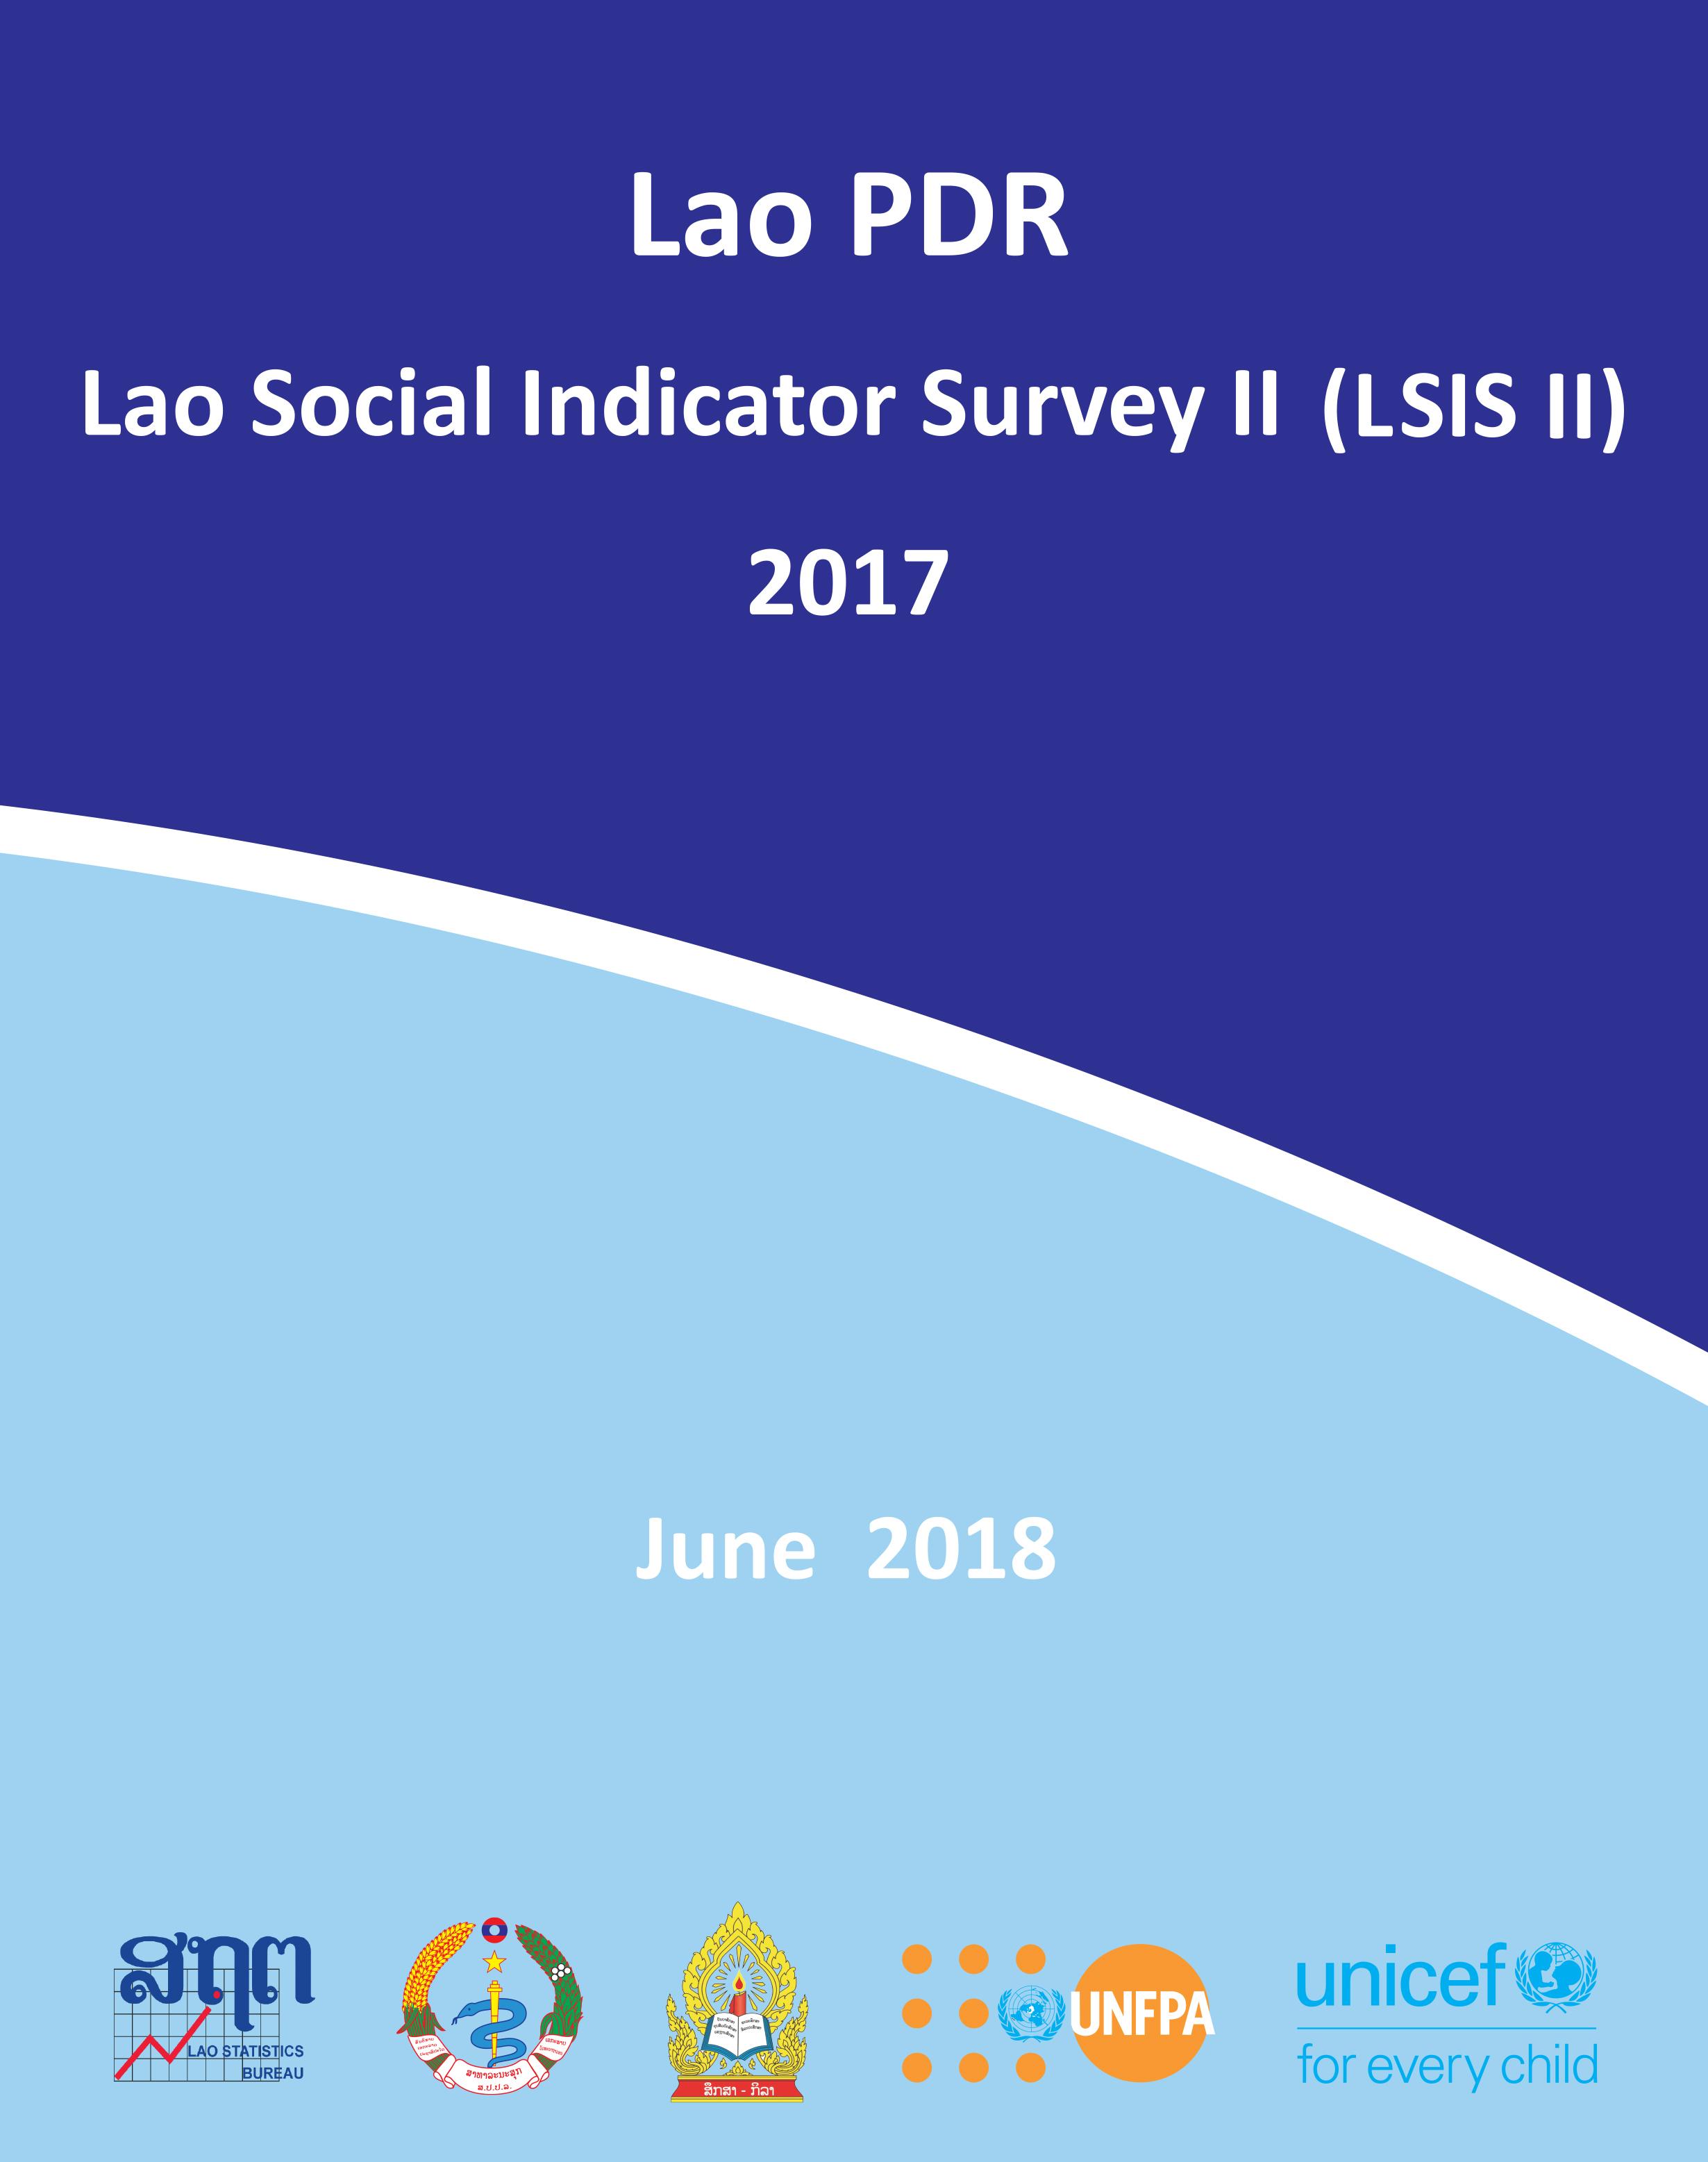 2017 MICS Social Indicator Survey II Survey - Cover